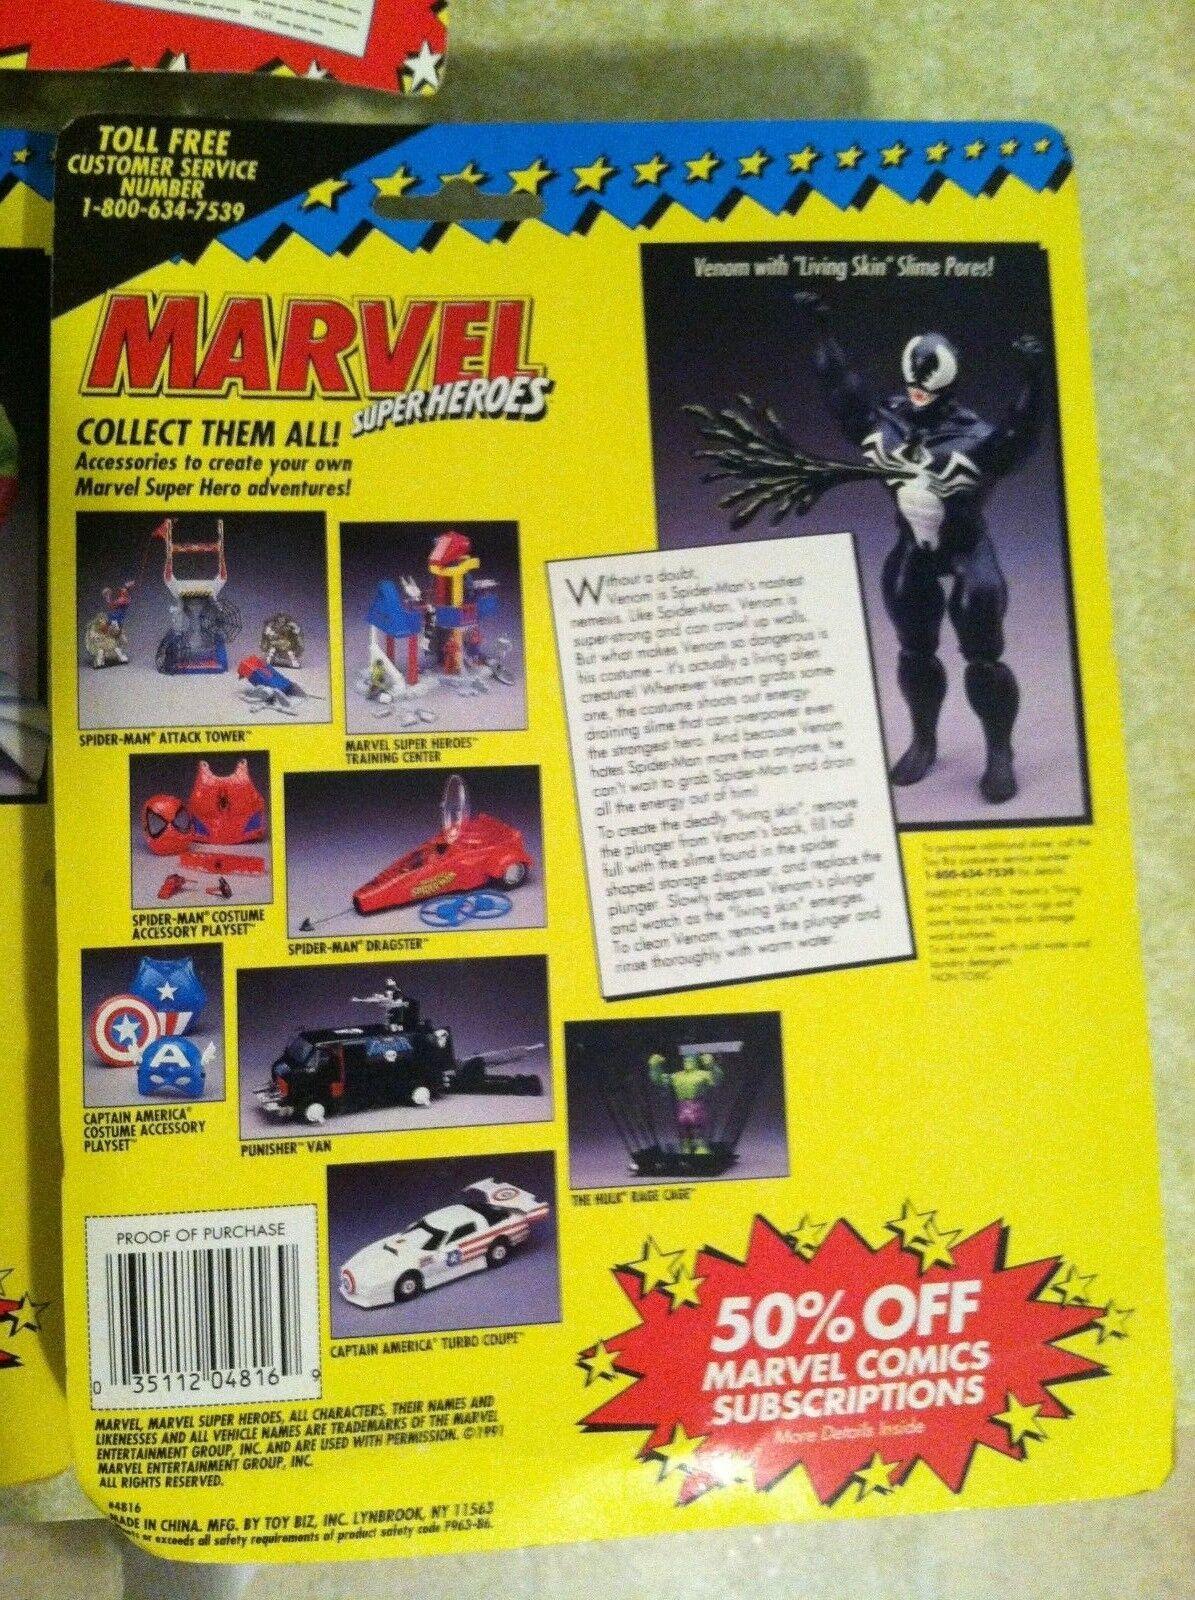 TOY BIZ new MARVEL heros heros heros (set of 5) spiderman green goblin venom deathlok x men f667bb